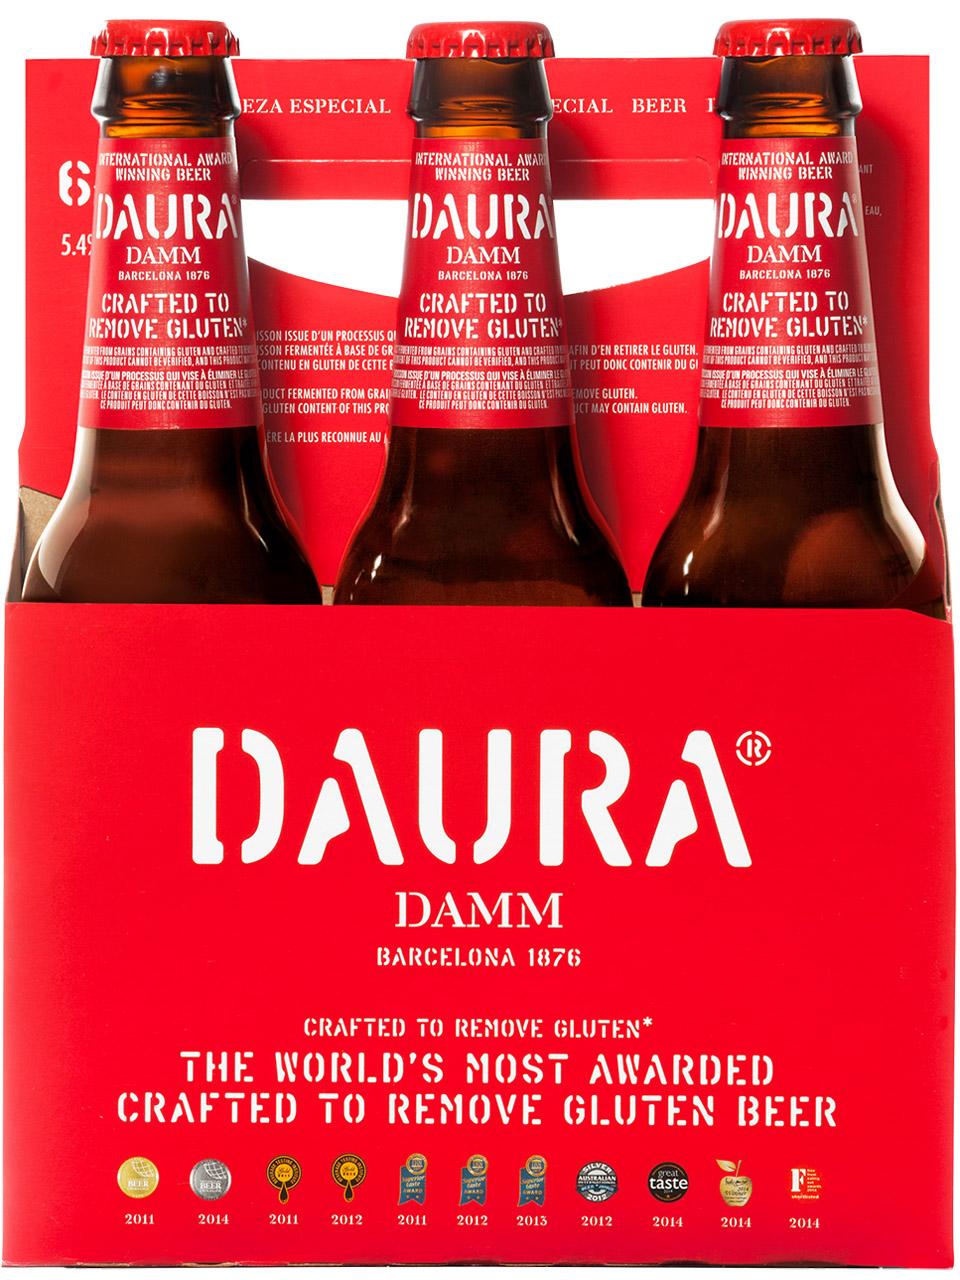 Daura Damm 6 Pack Bottles